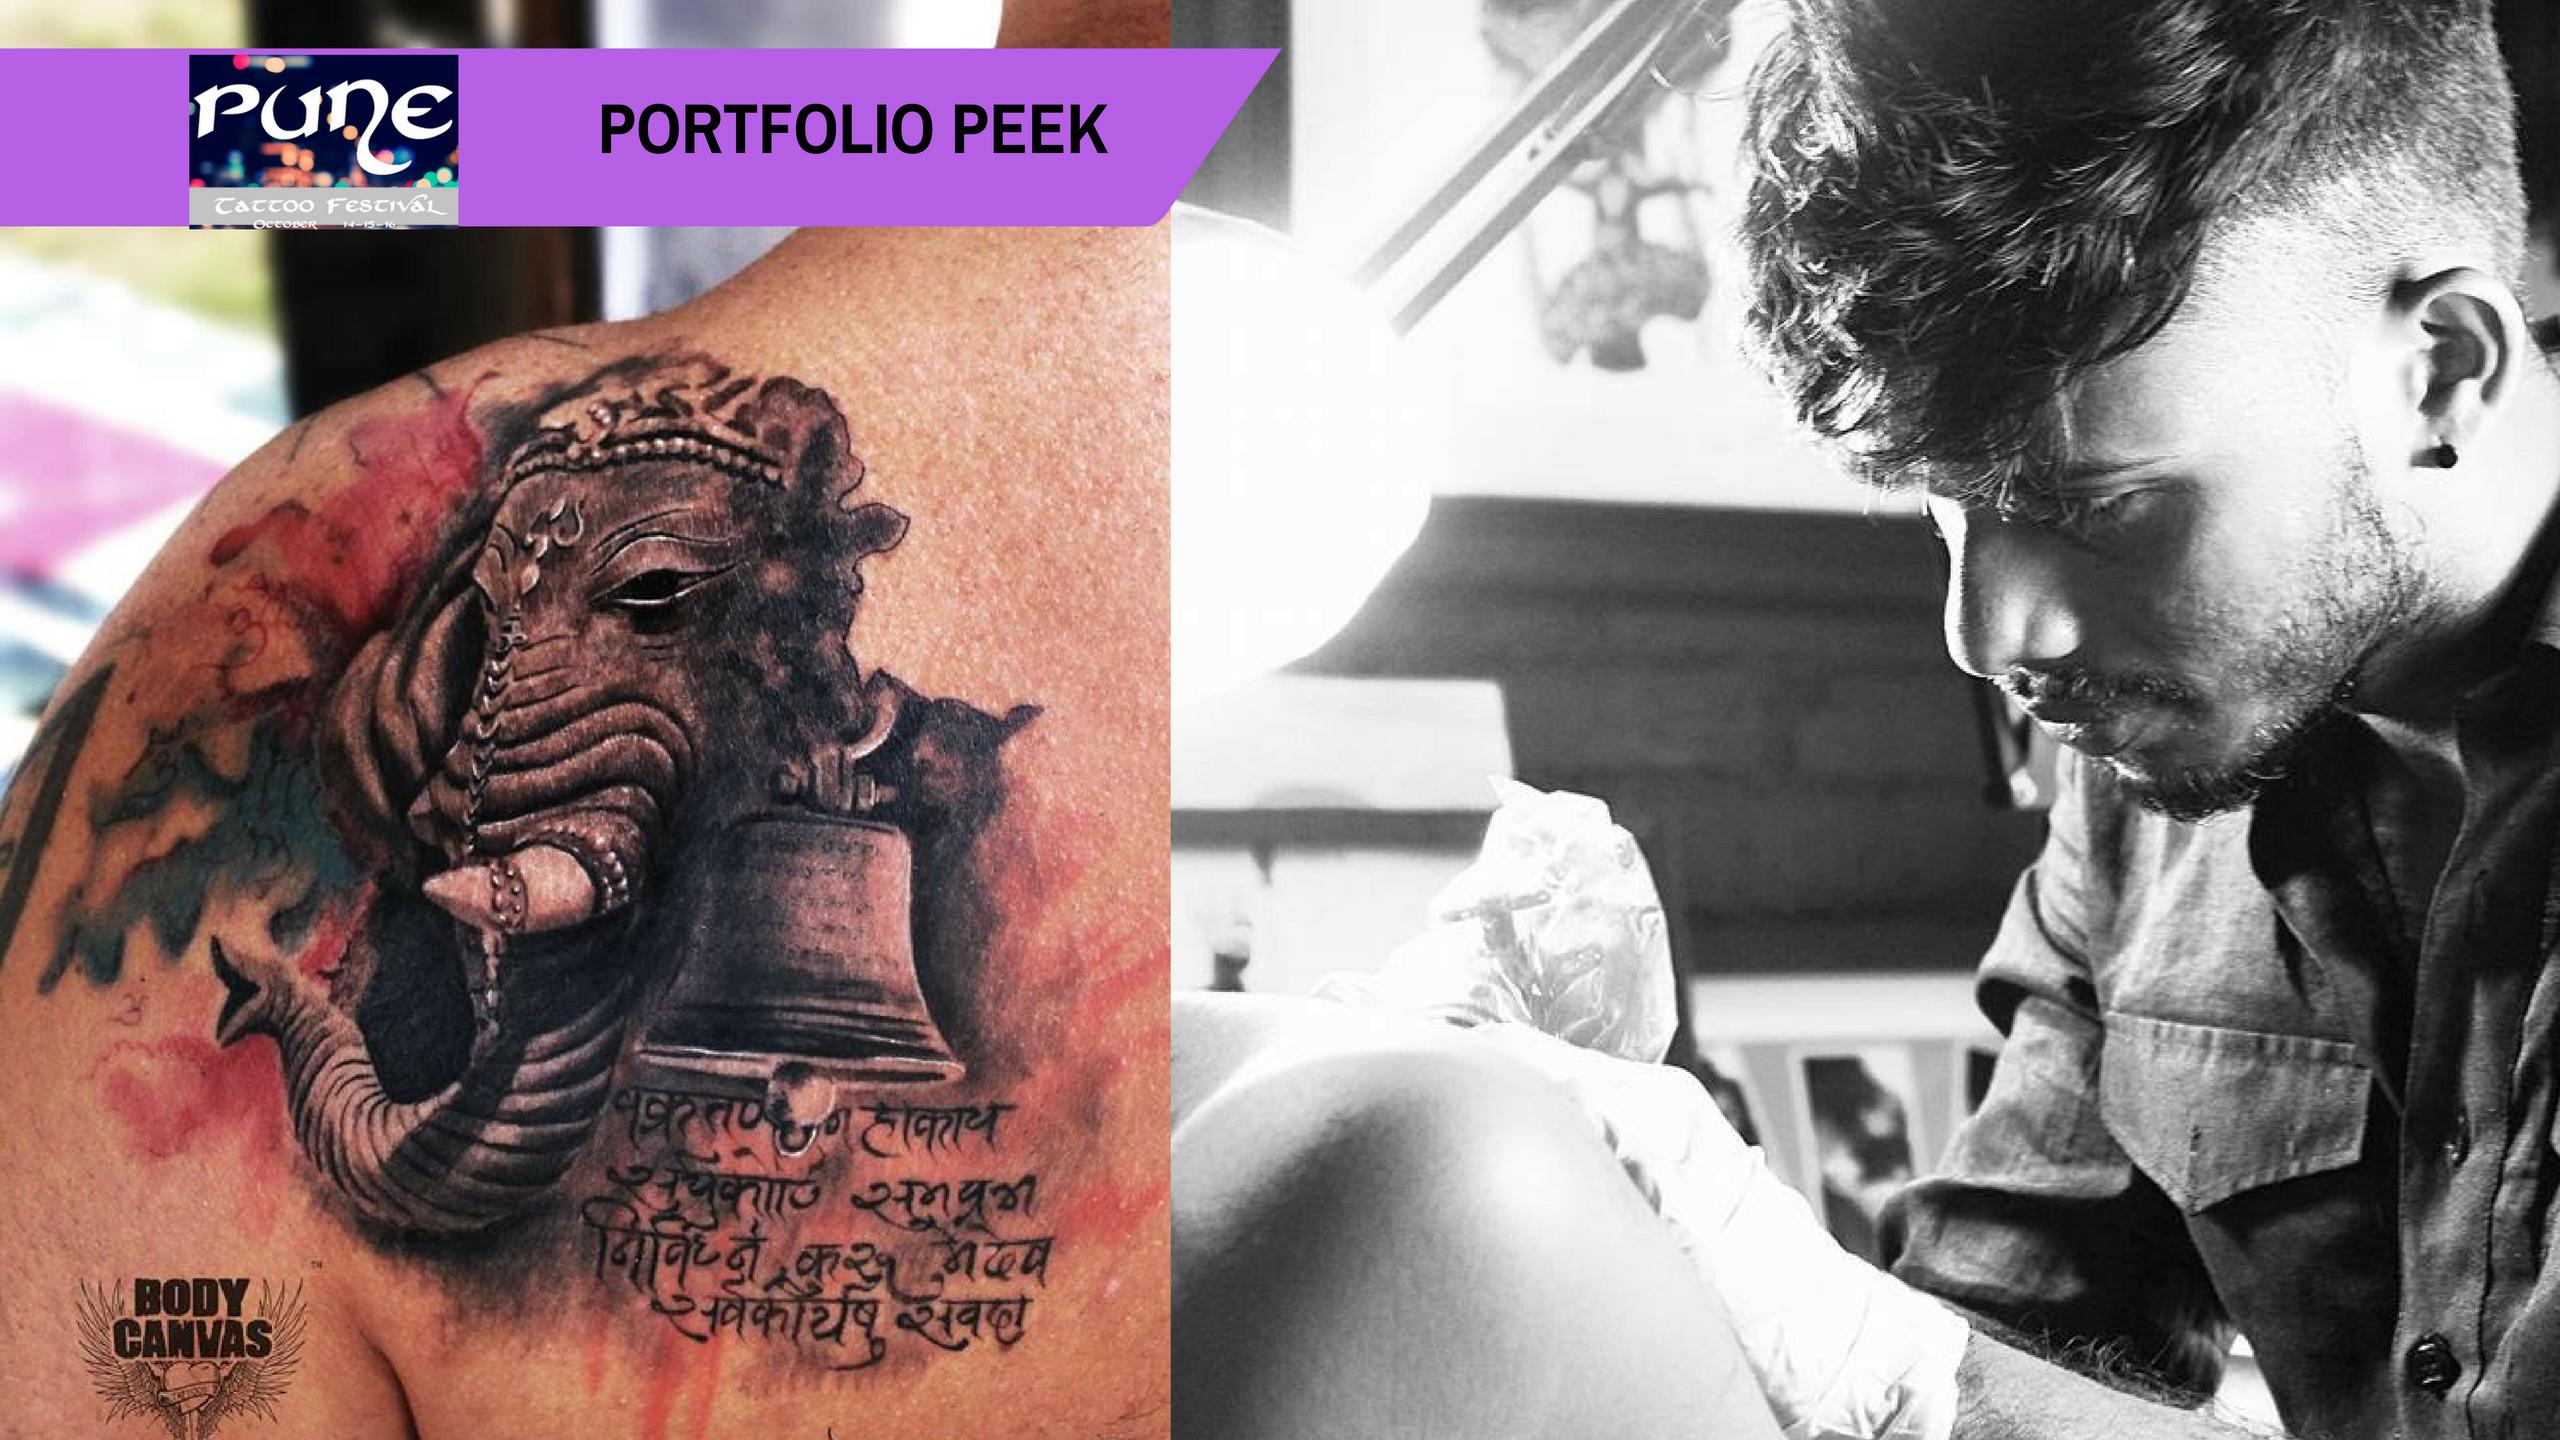 Pune Tattoo Fest Portfolio Peek: Amir Shaikh; the new-age tattoo artist